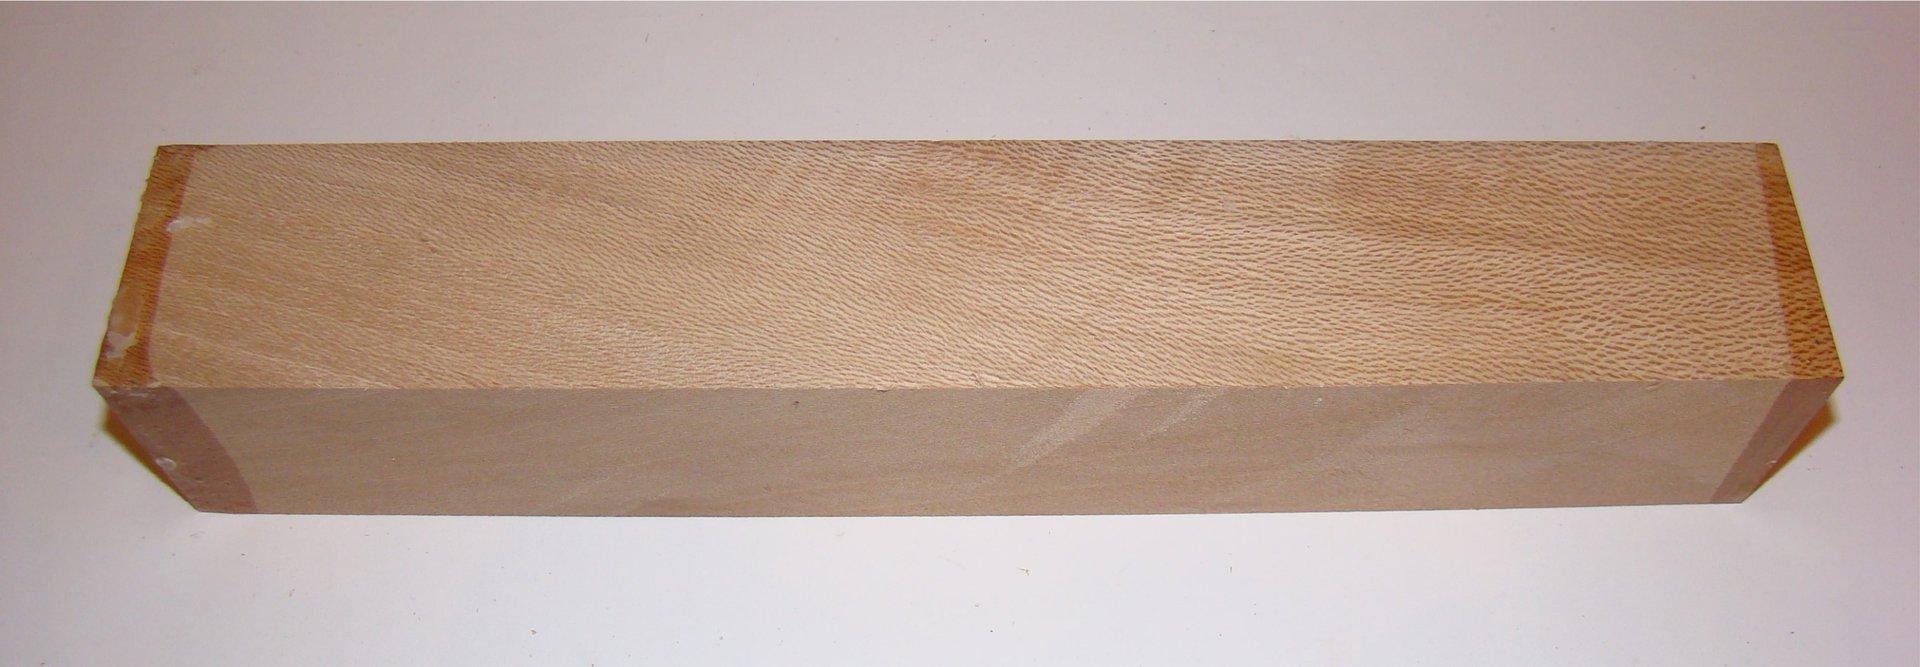 platane 3x3x30cm. Black Bedroom Furniture Sets. Home Design Ideas